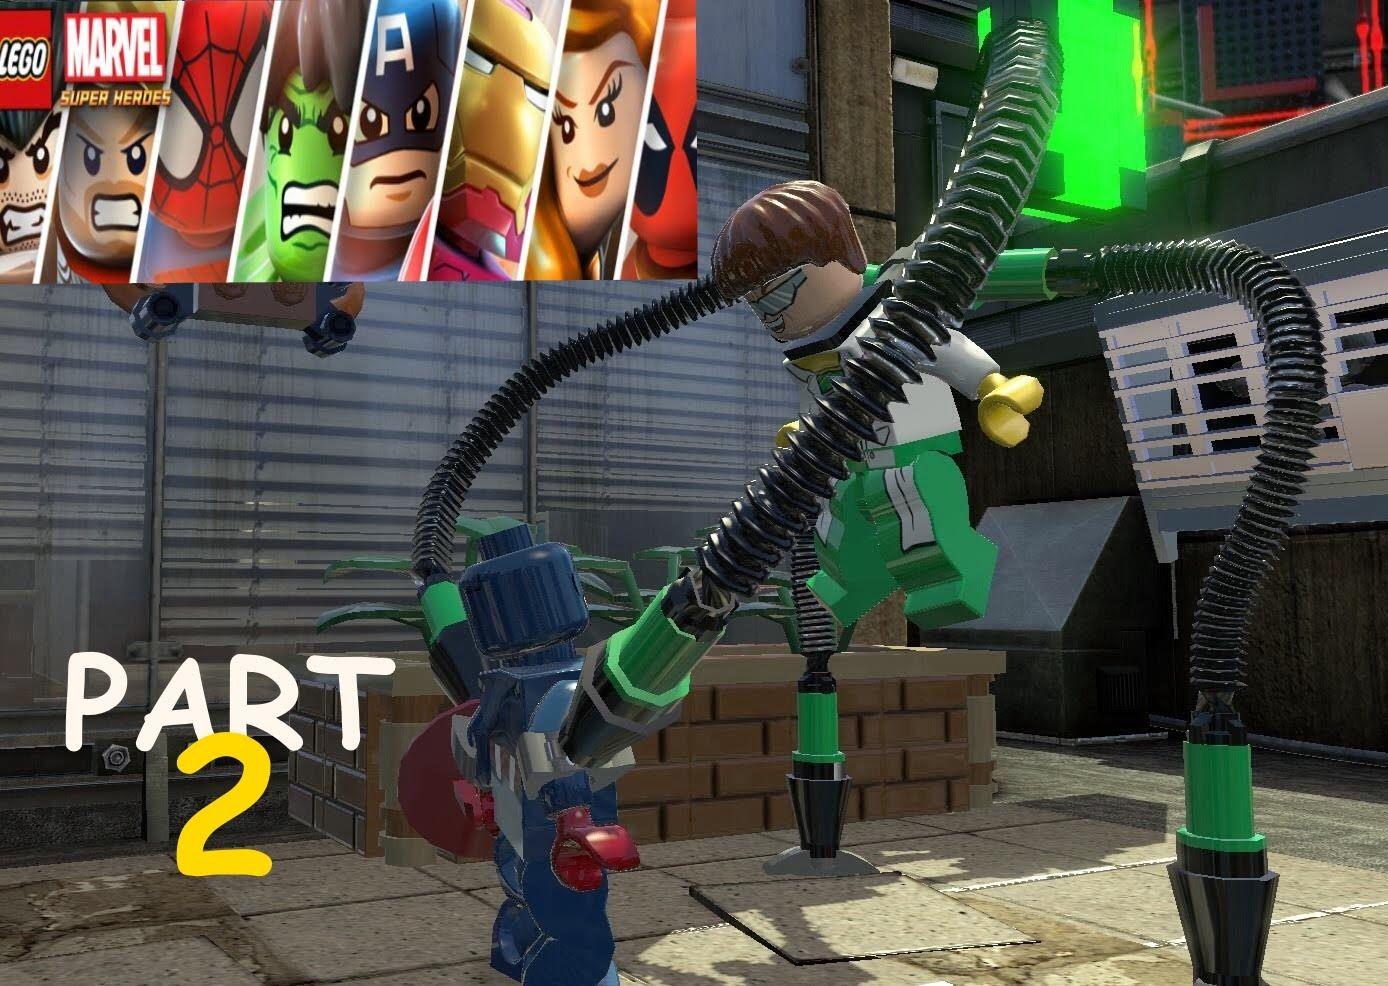 Lego Marvel Super Heroes Walkthrough Part 2 Lego Xbox Videogames